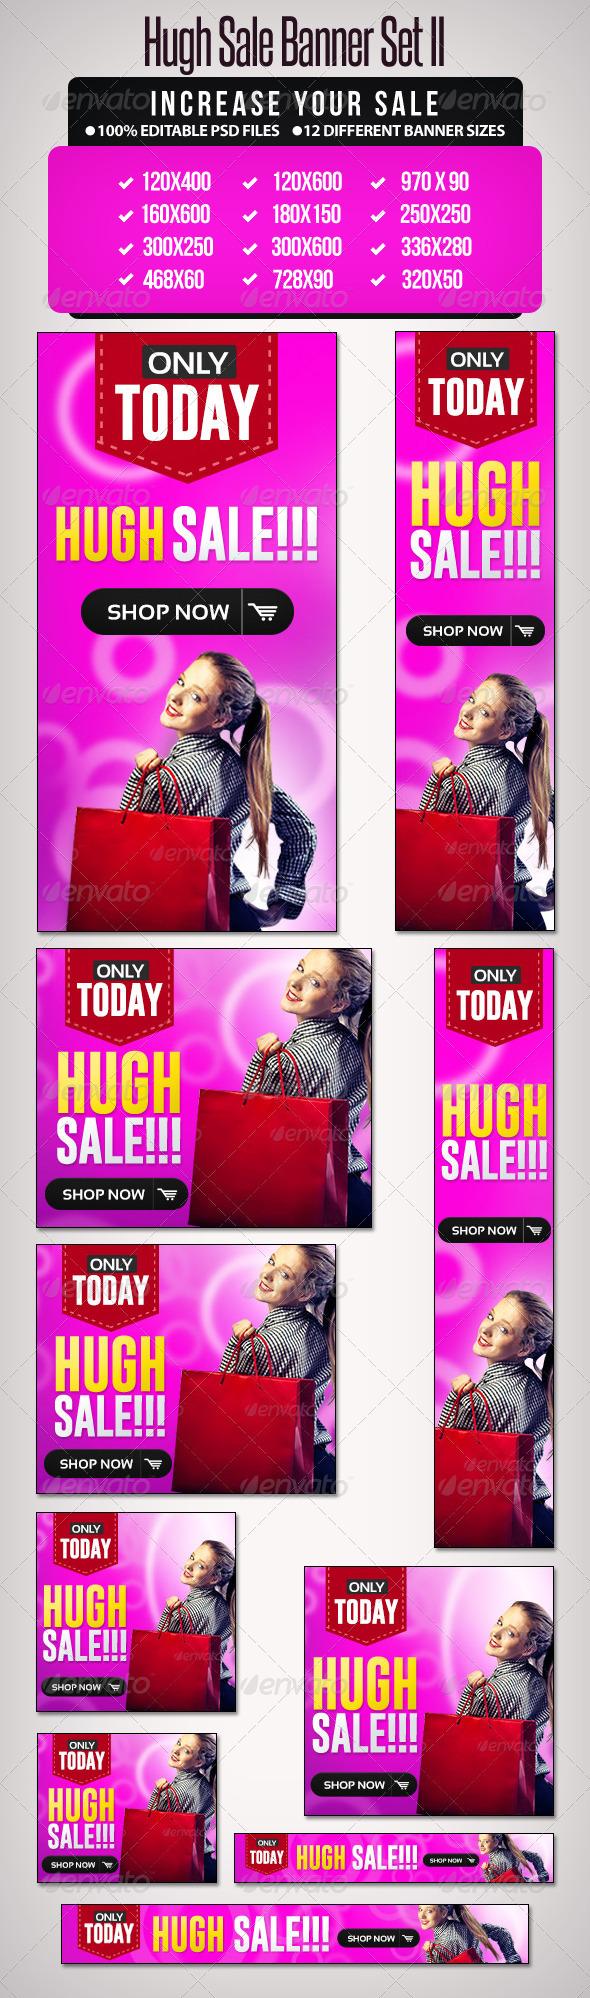 Hugh Sale Banner Set - 2 - Banners & Ads Web Elements